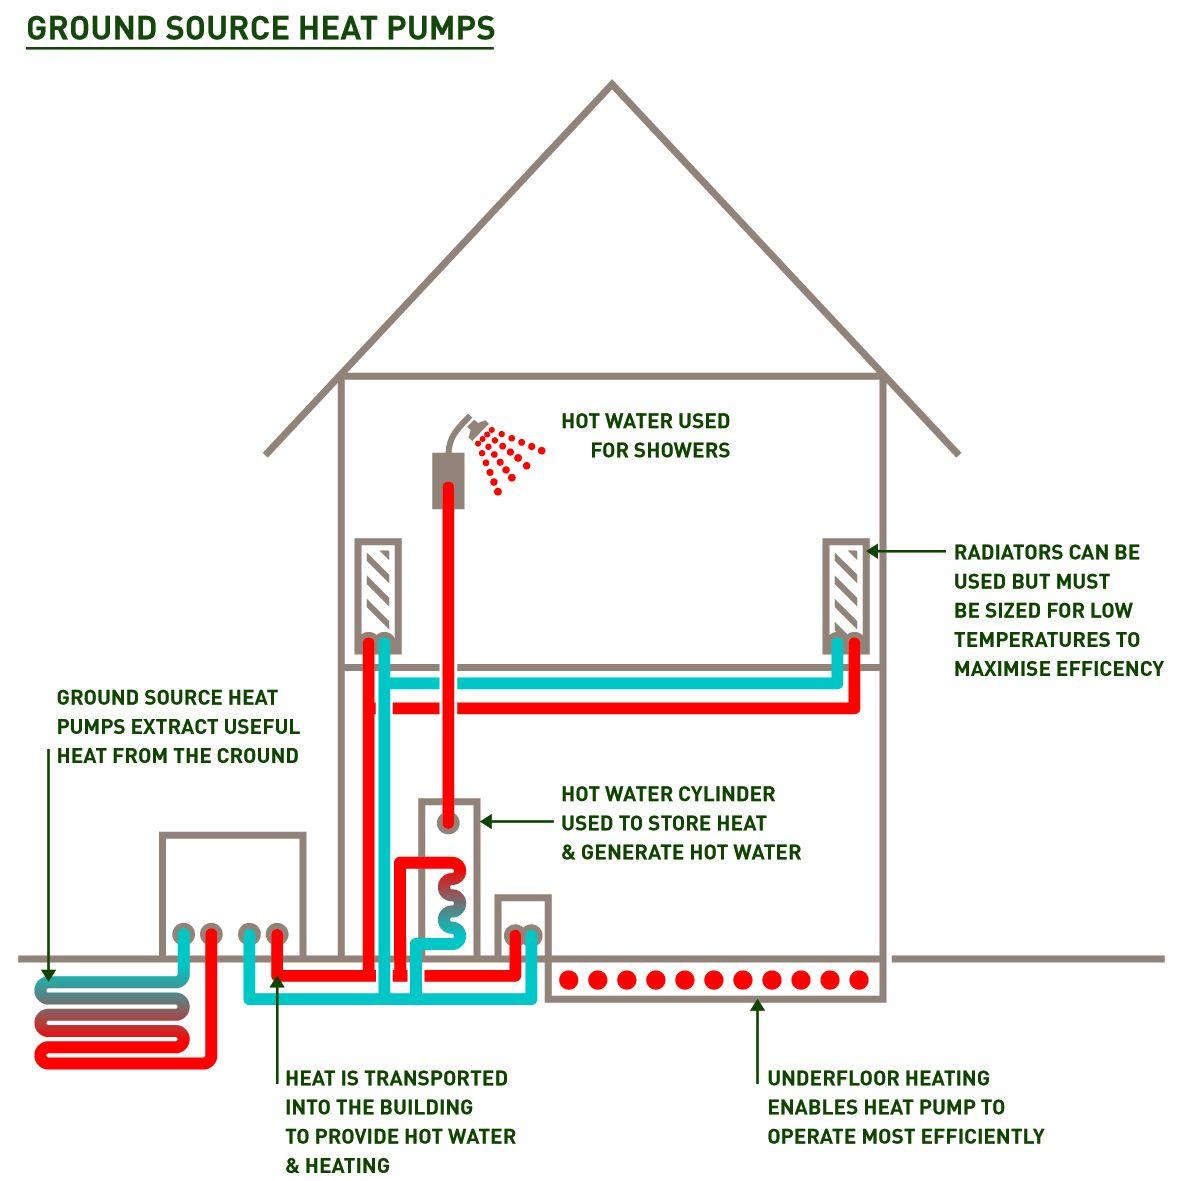 Remarkable Ground Source Heat Pumps Aj Energy Consultants Wiring Cloud Hemtshollocom